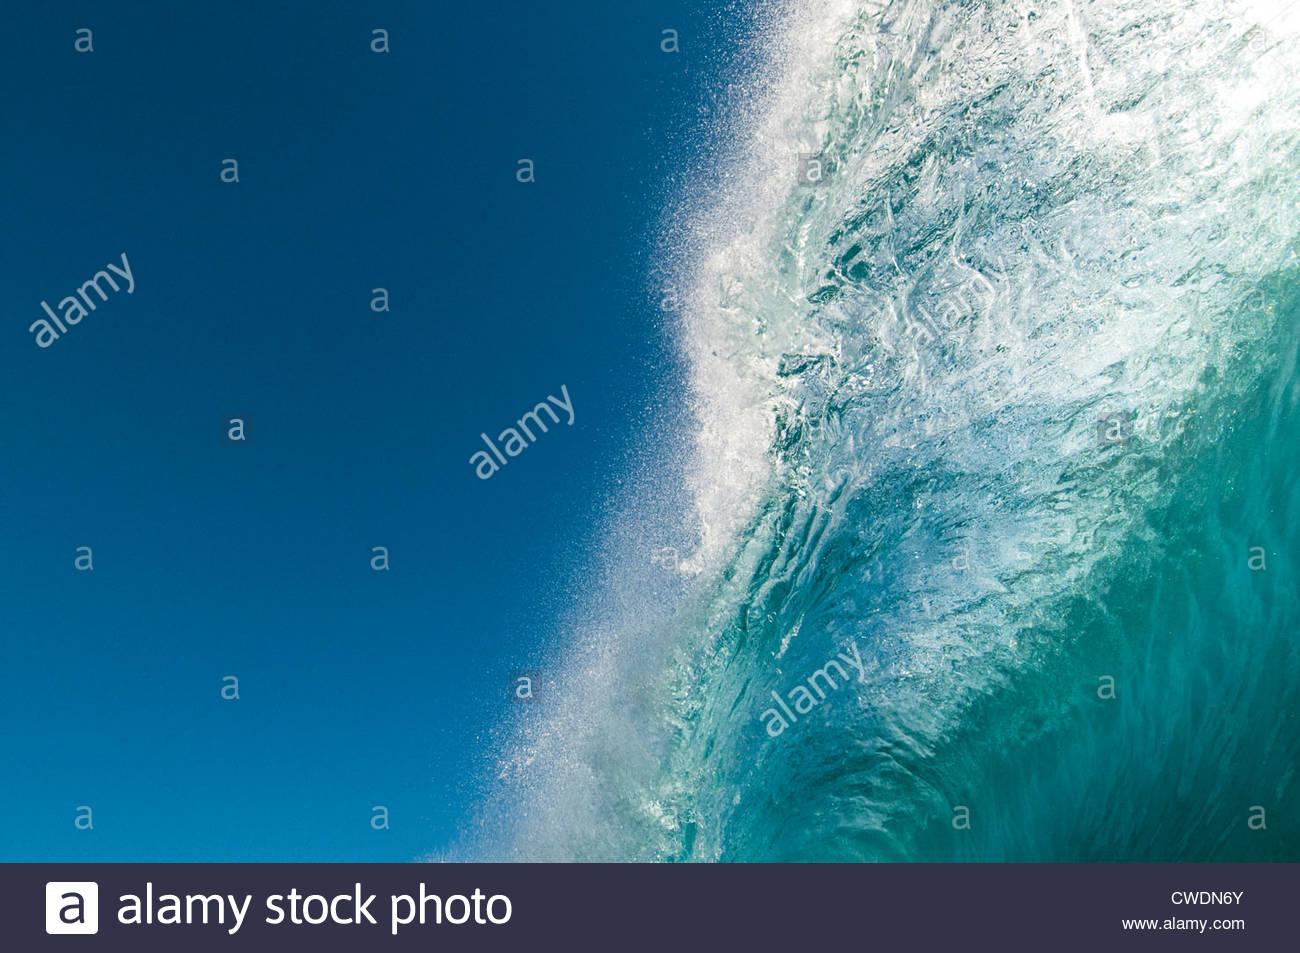 Pitching lip of a breaking wave, Rarotonga, Cook Islands. - Stock Image